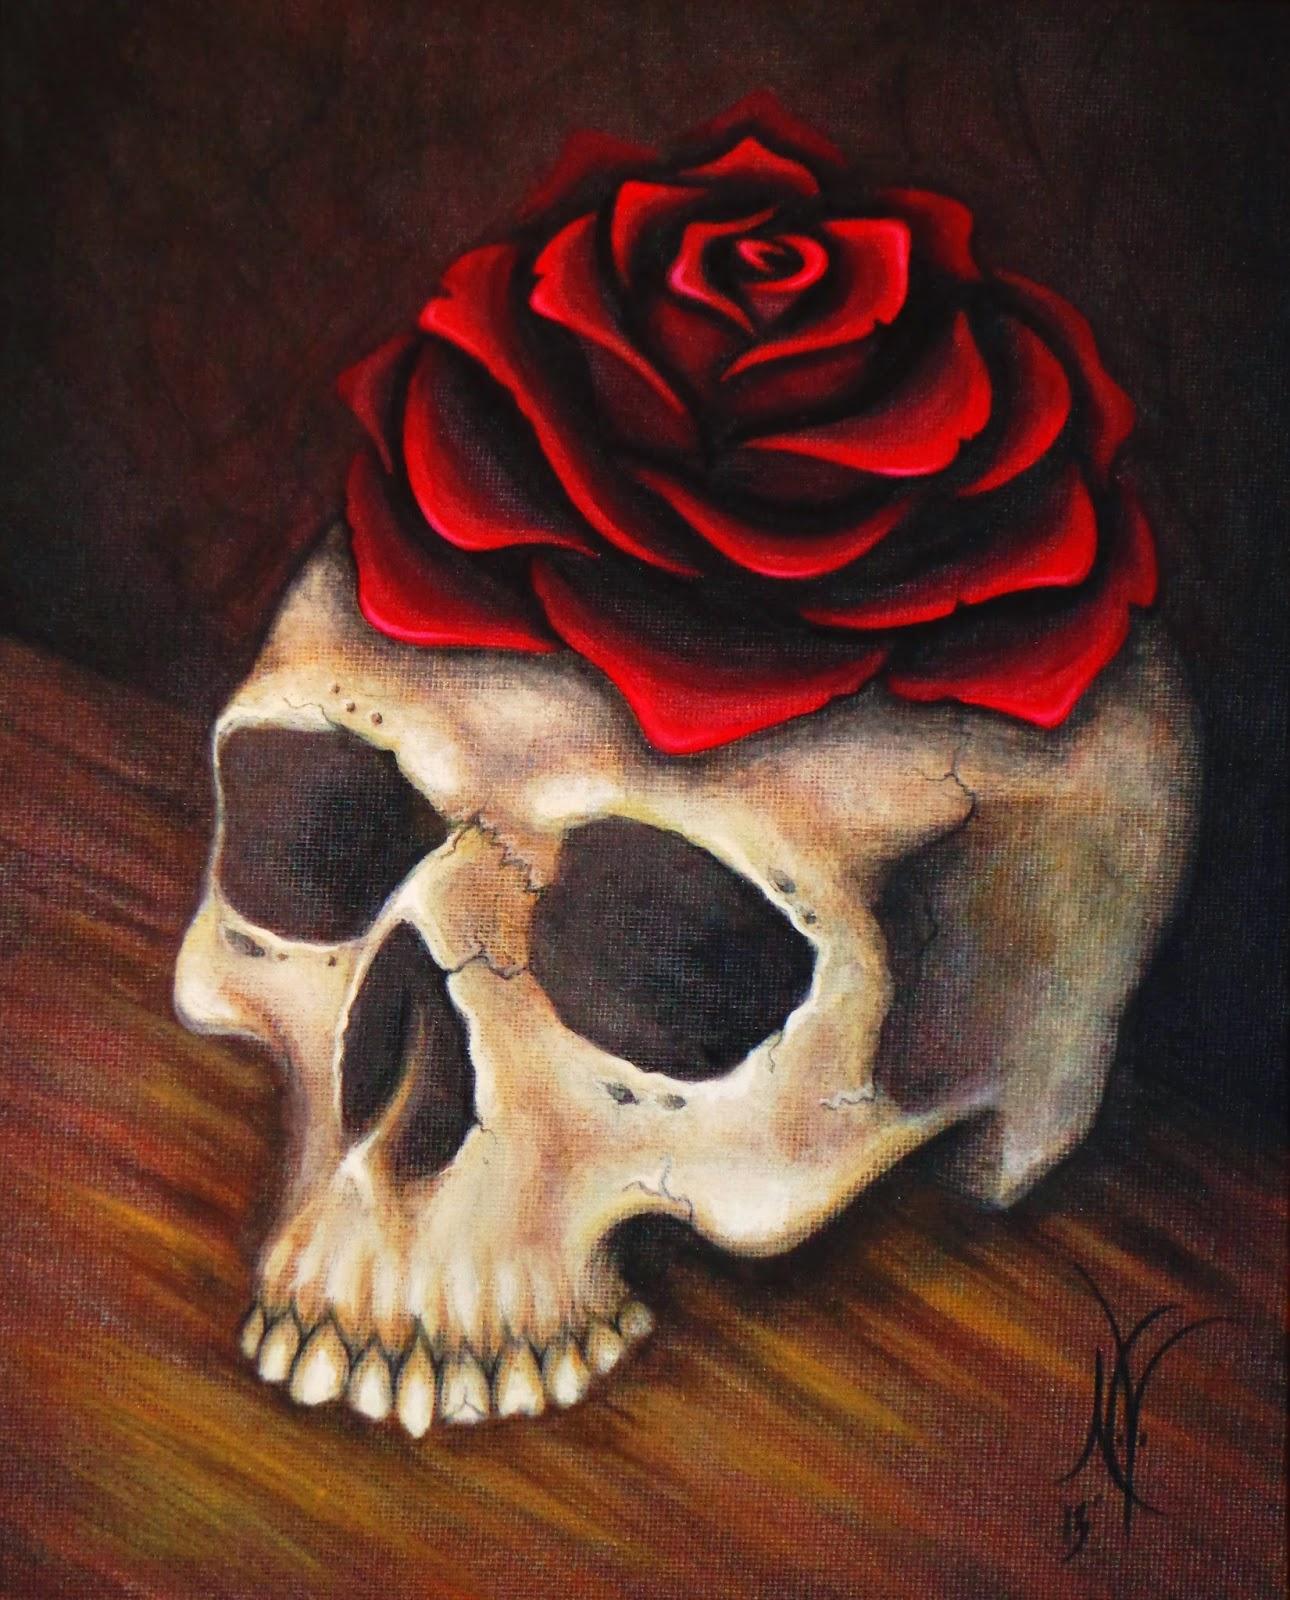 https://www.etsy.com/listing/166484010/8x10-print-gothic-fantasy-rose-skull?ref=shop_home_active_15